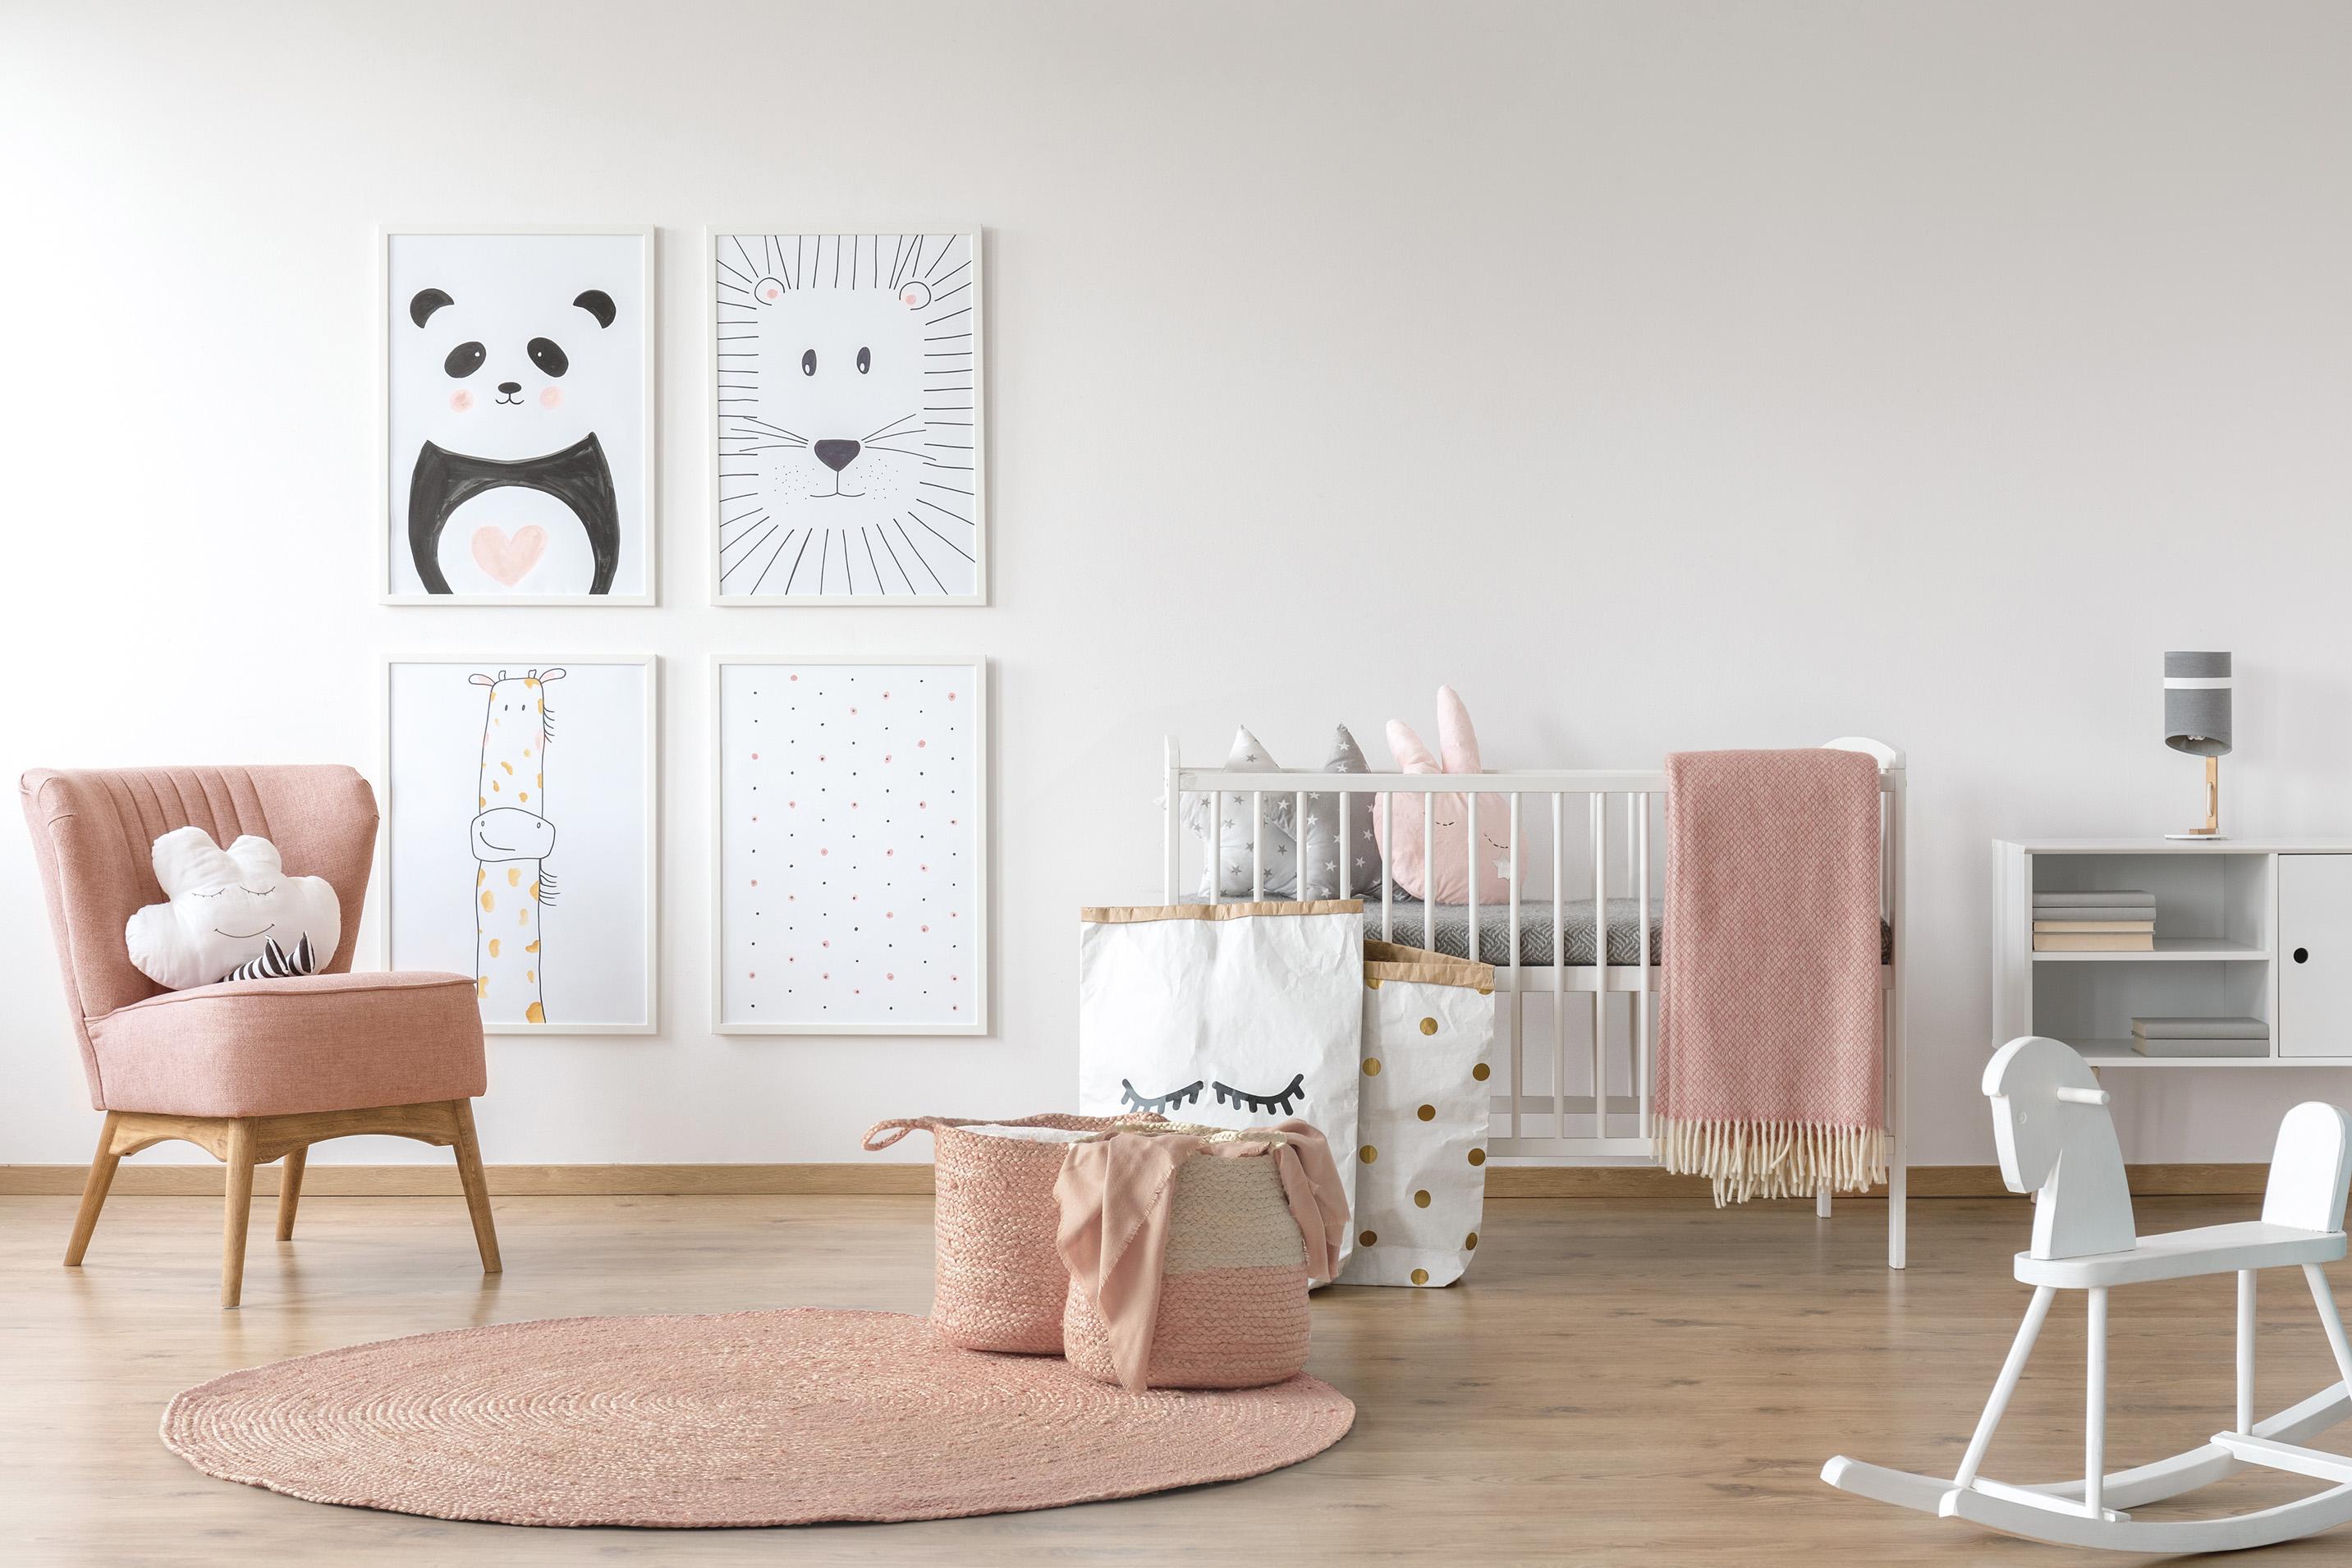 Alfombra rosa empolvado, estancias elegantes.